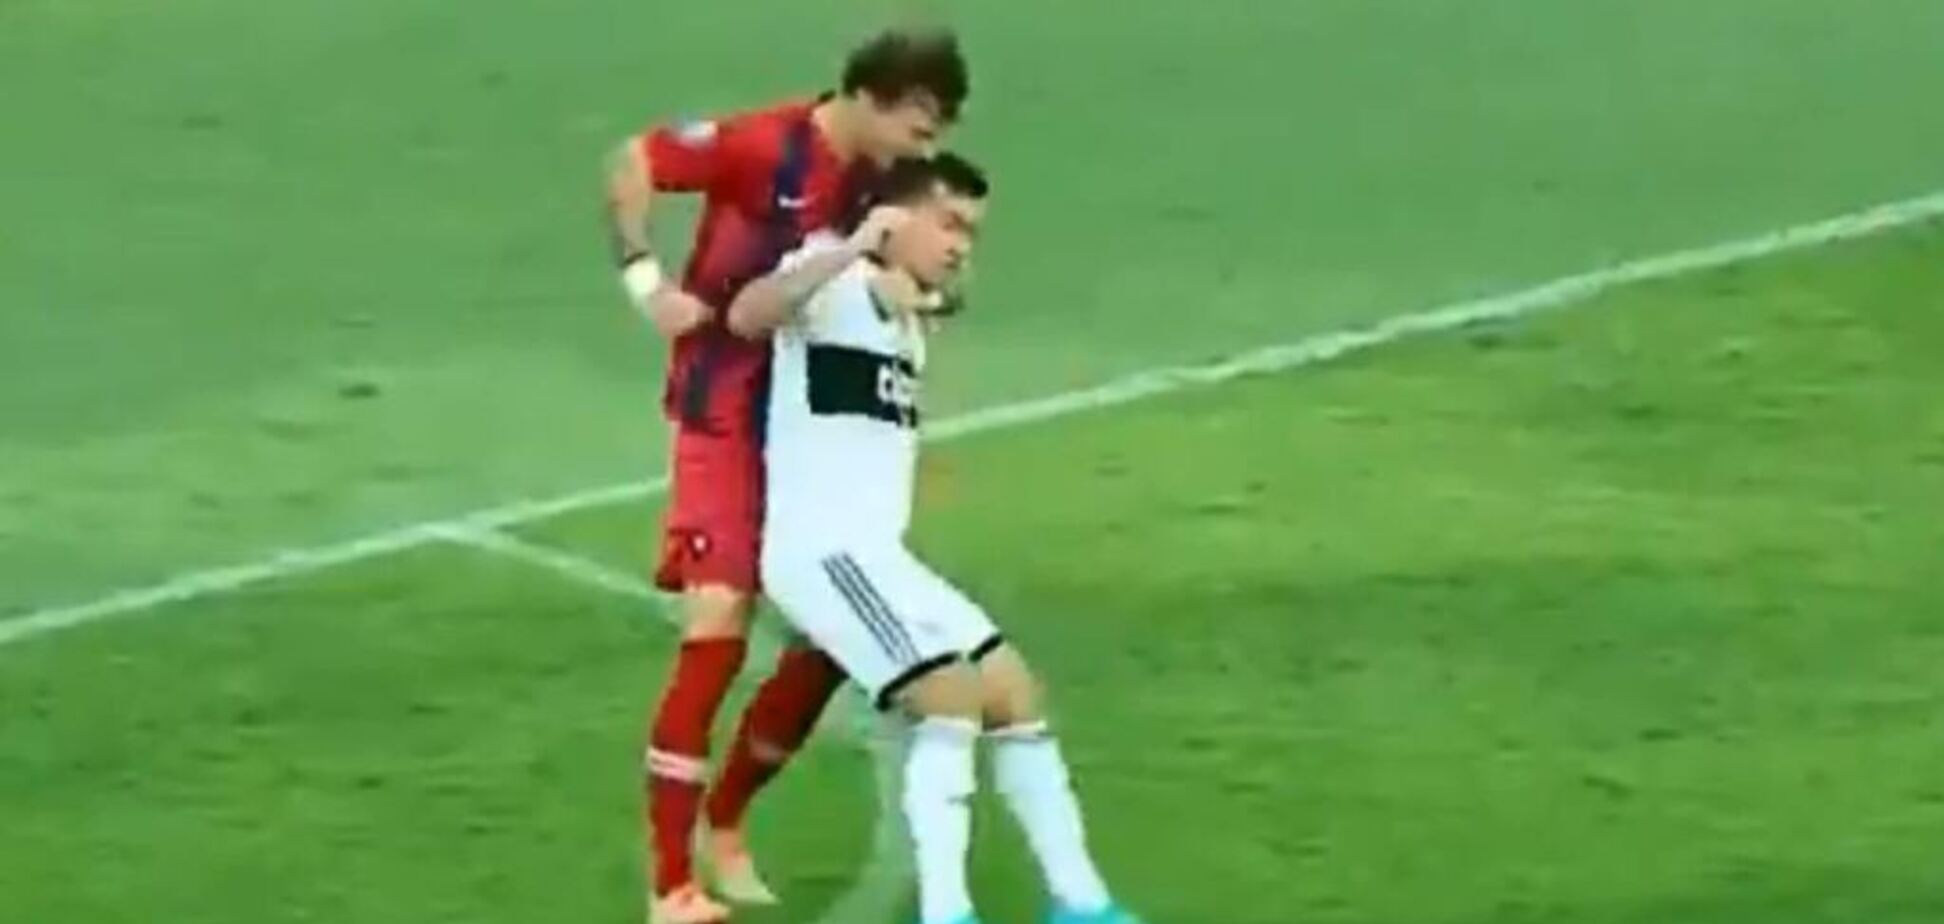 Фернандо Аморебьета укусил соперника